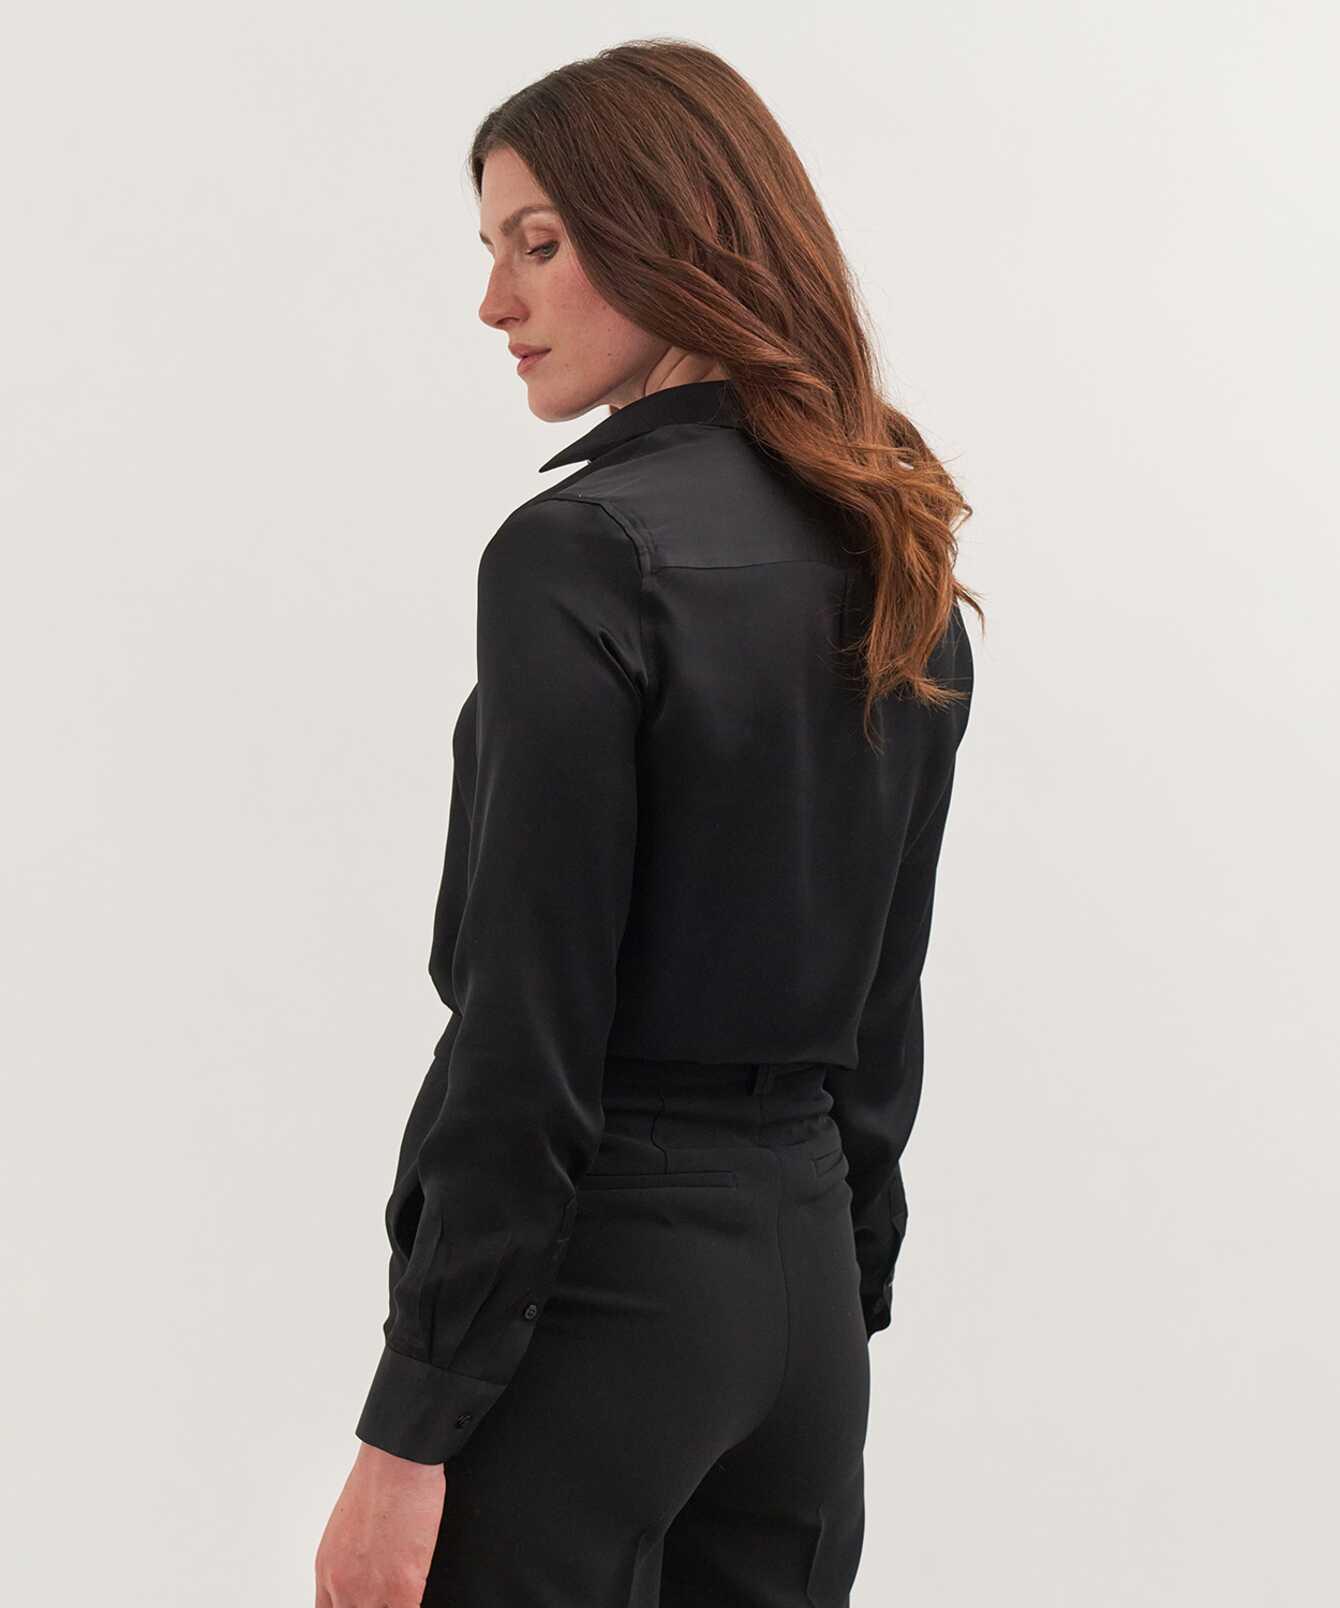 Shirt Tilde Glossy Black The Shirt Factory